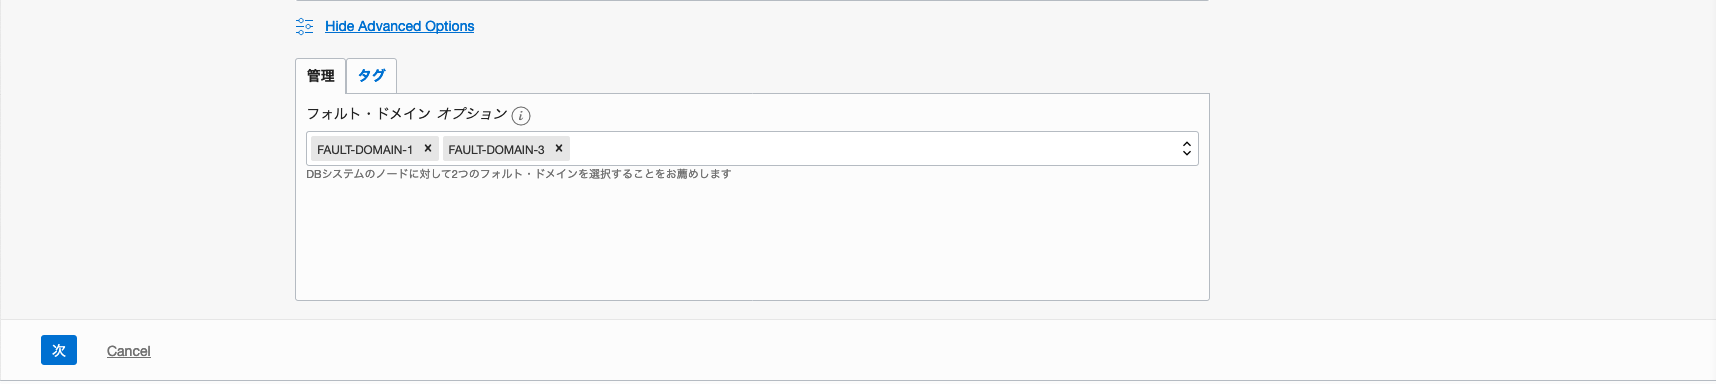 03_RAC作成03.png